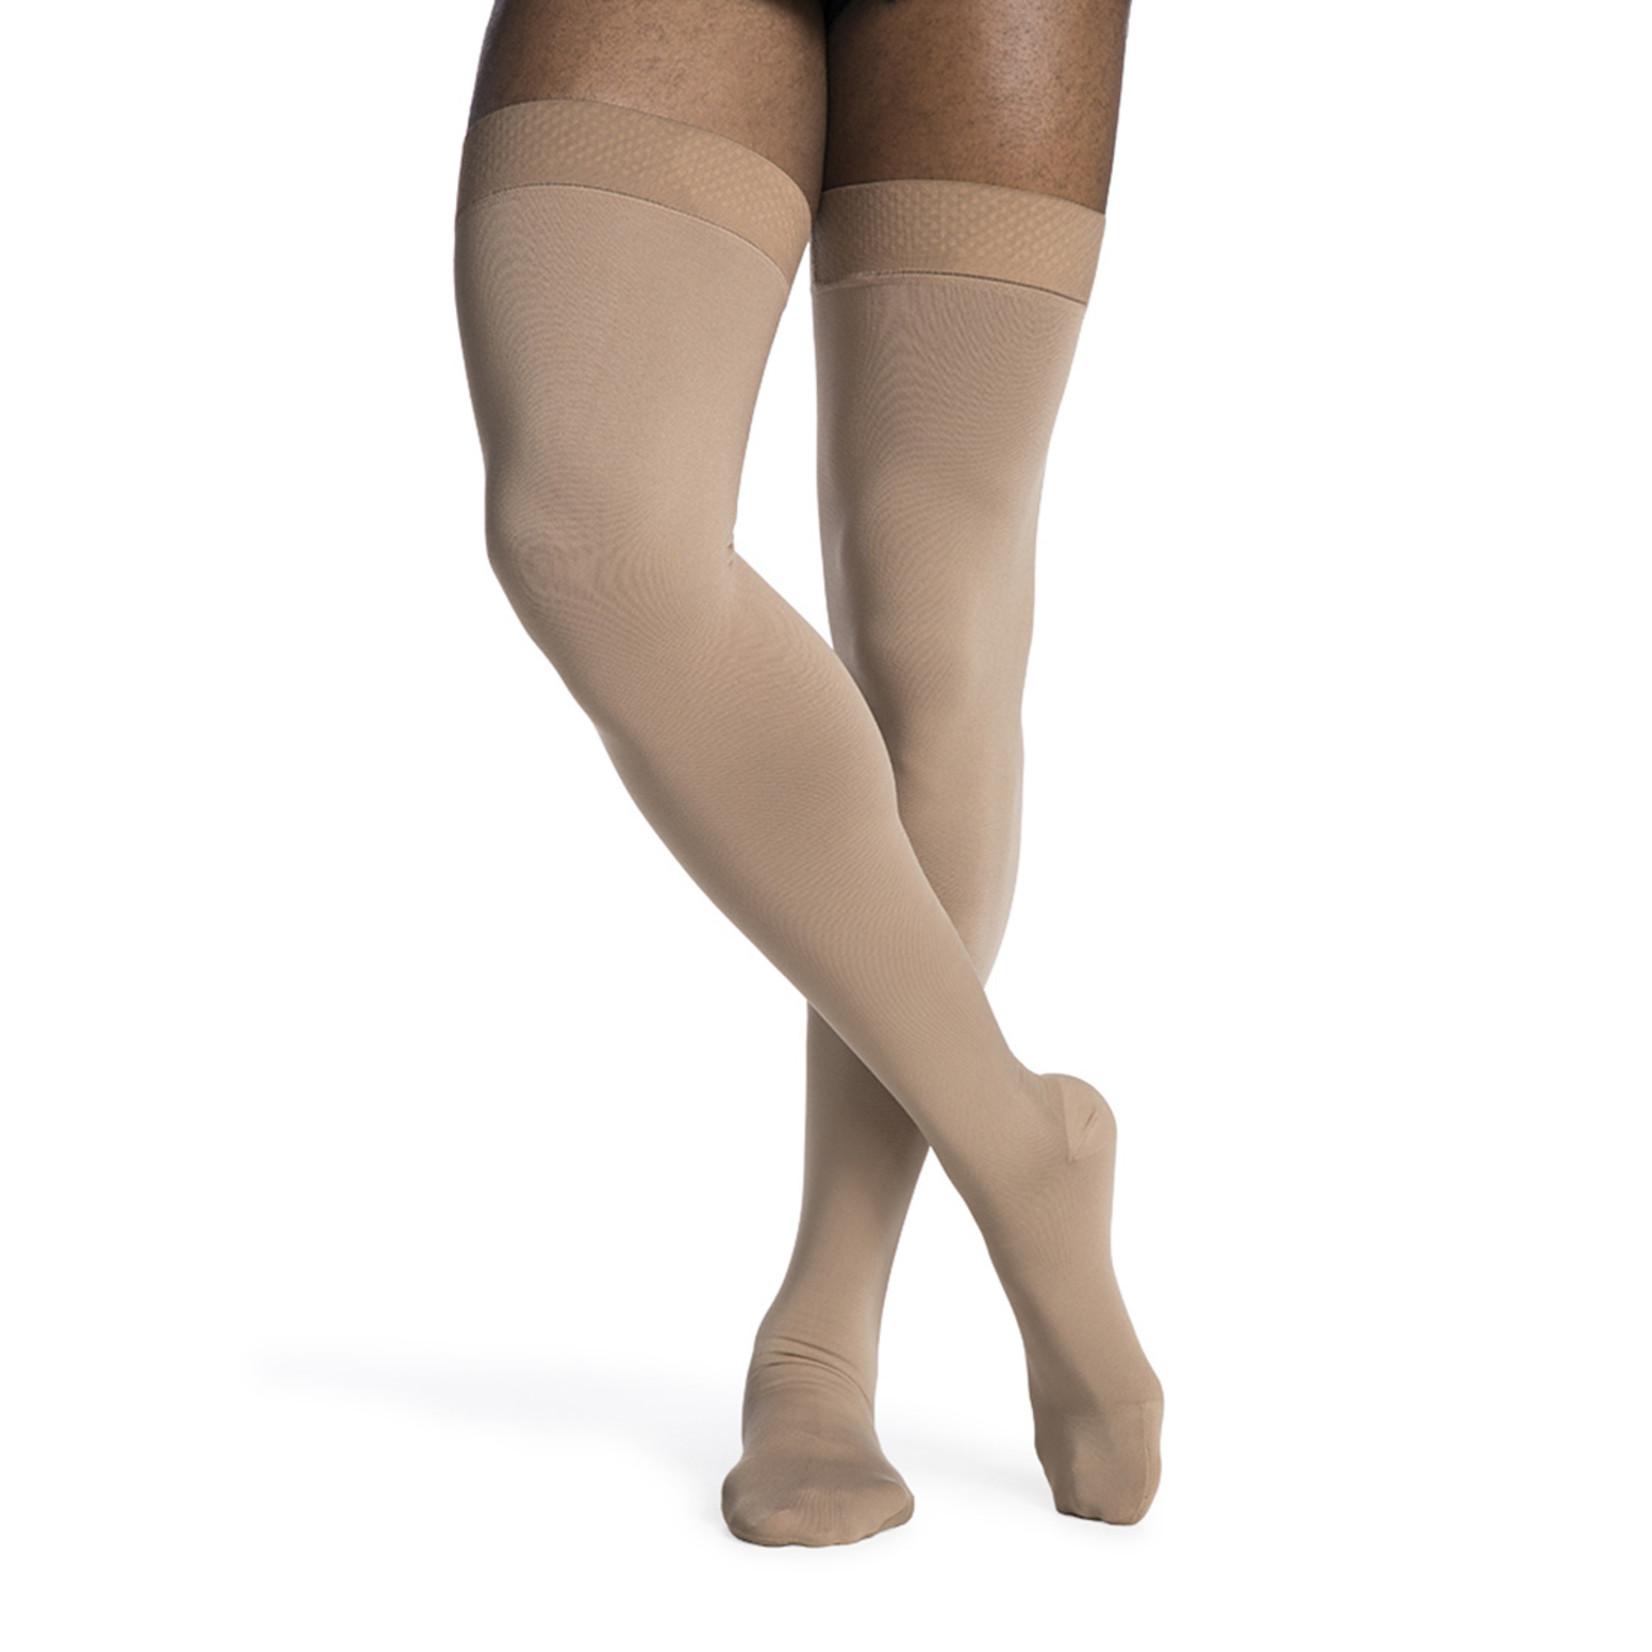 SIGVARIS Men's DYNAVEN Thigh-High 20-30mmHg LS - Large Short Light Beige (Crispa) Closed Toe